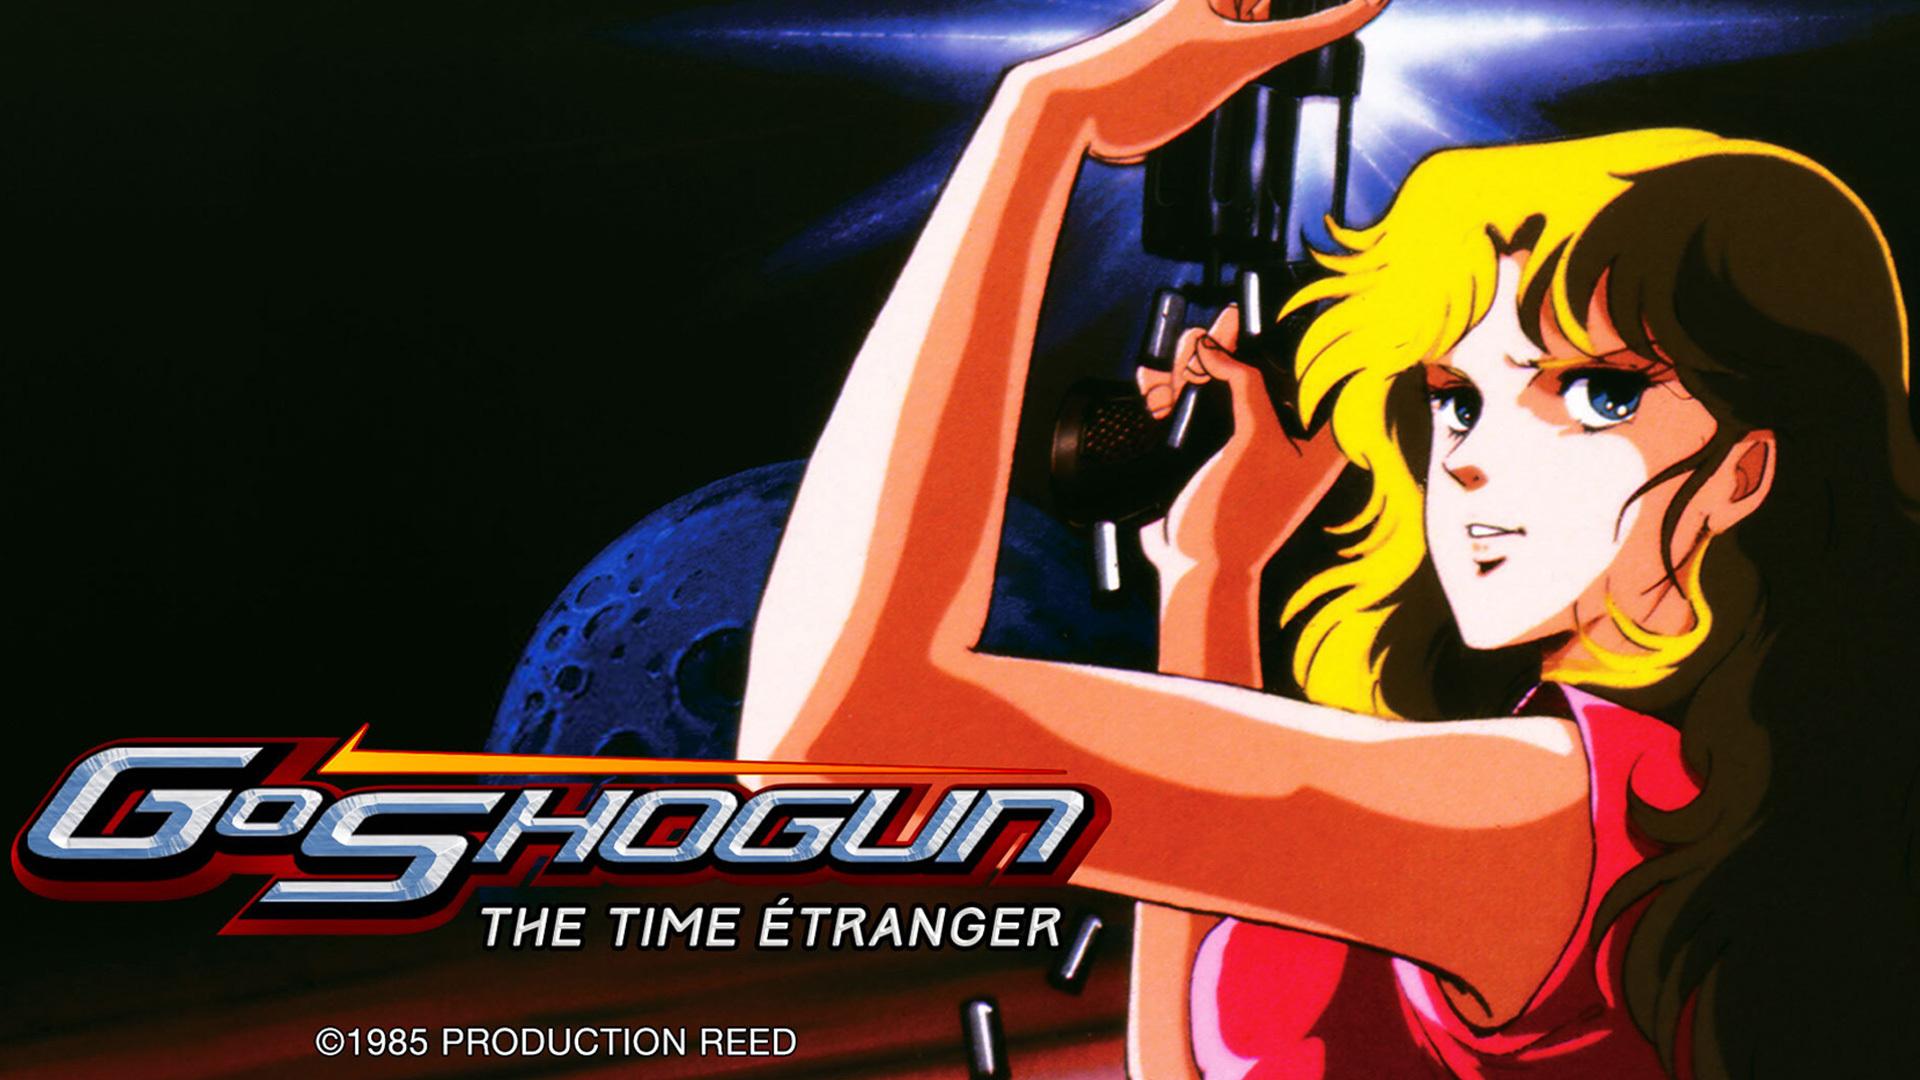 GoShogun: The Time Etrainger